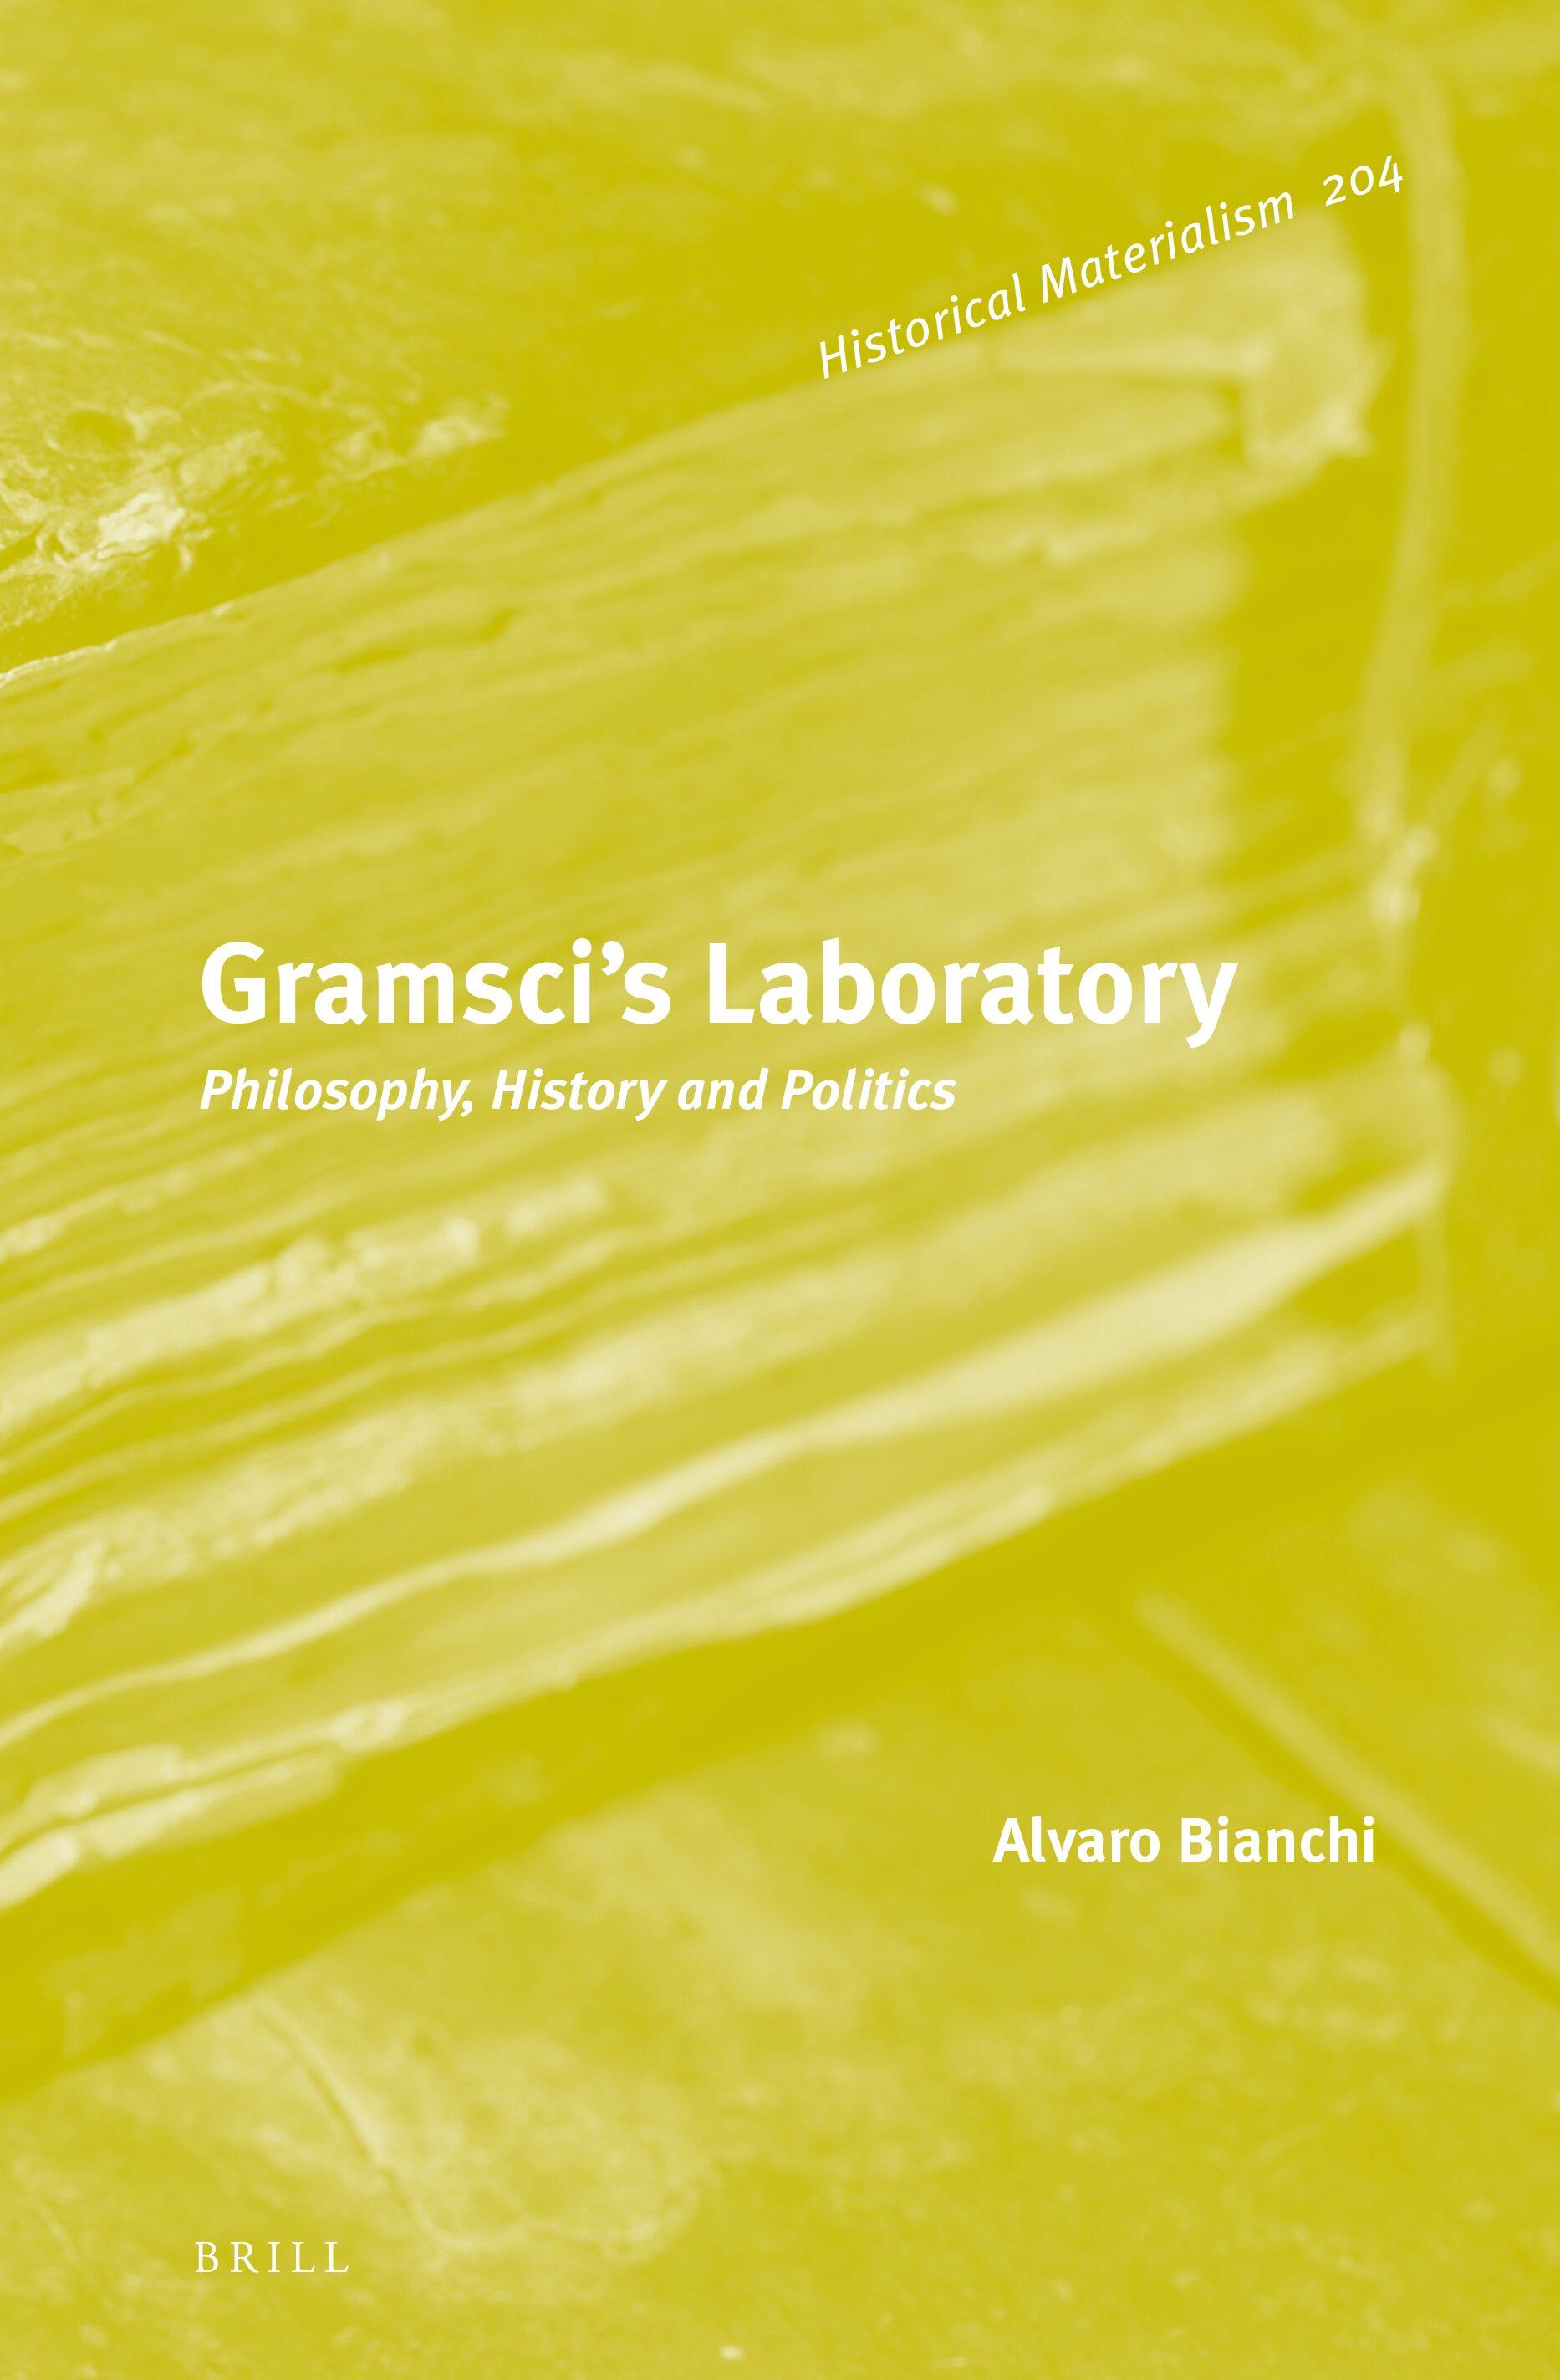 Fiori Bianchi Fight List.War Of Movement War Of Position In Gramsci S Laboratory